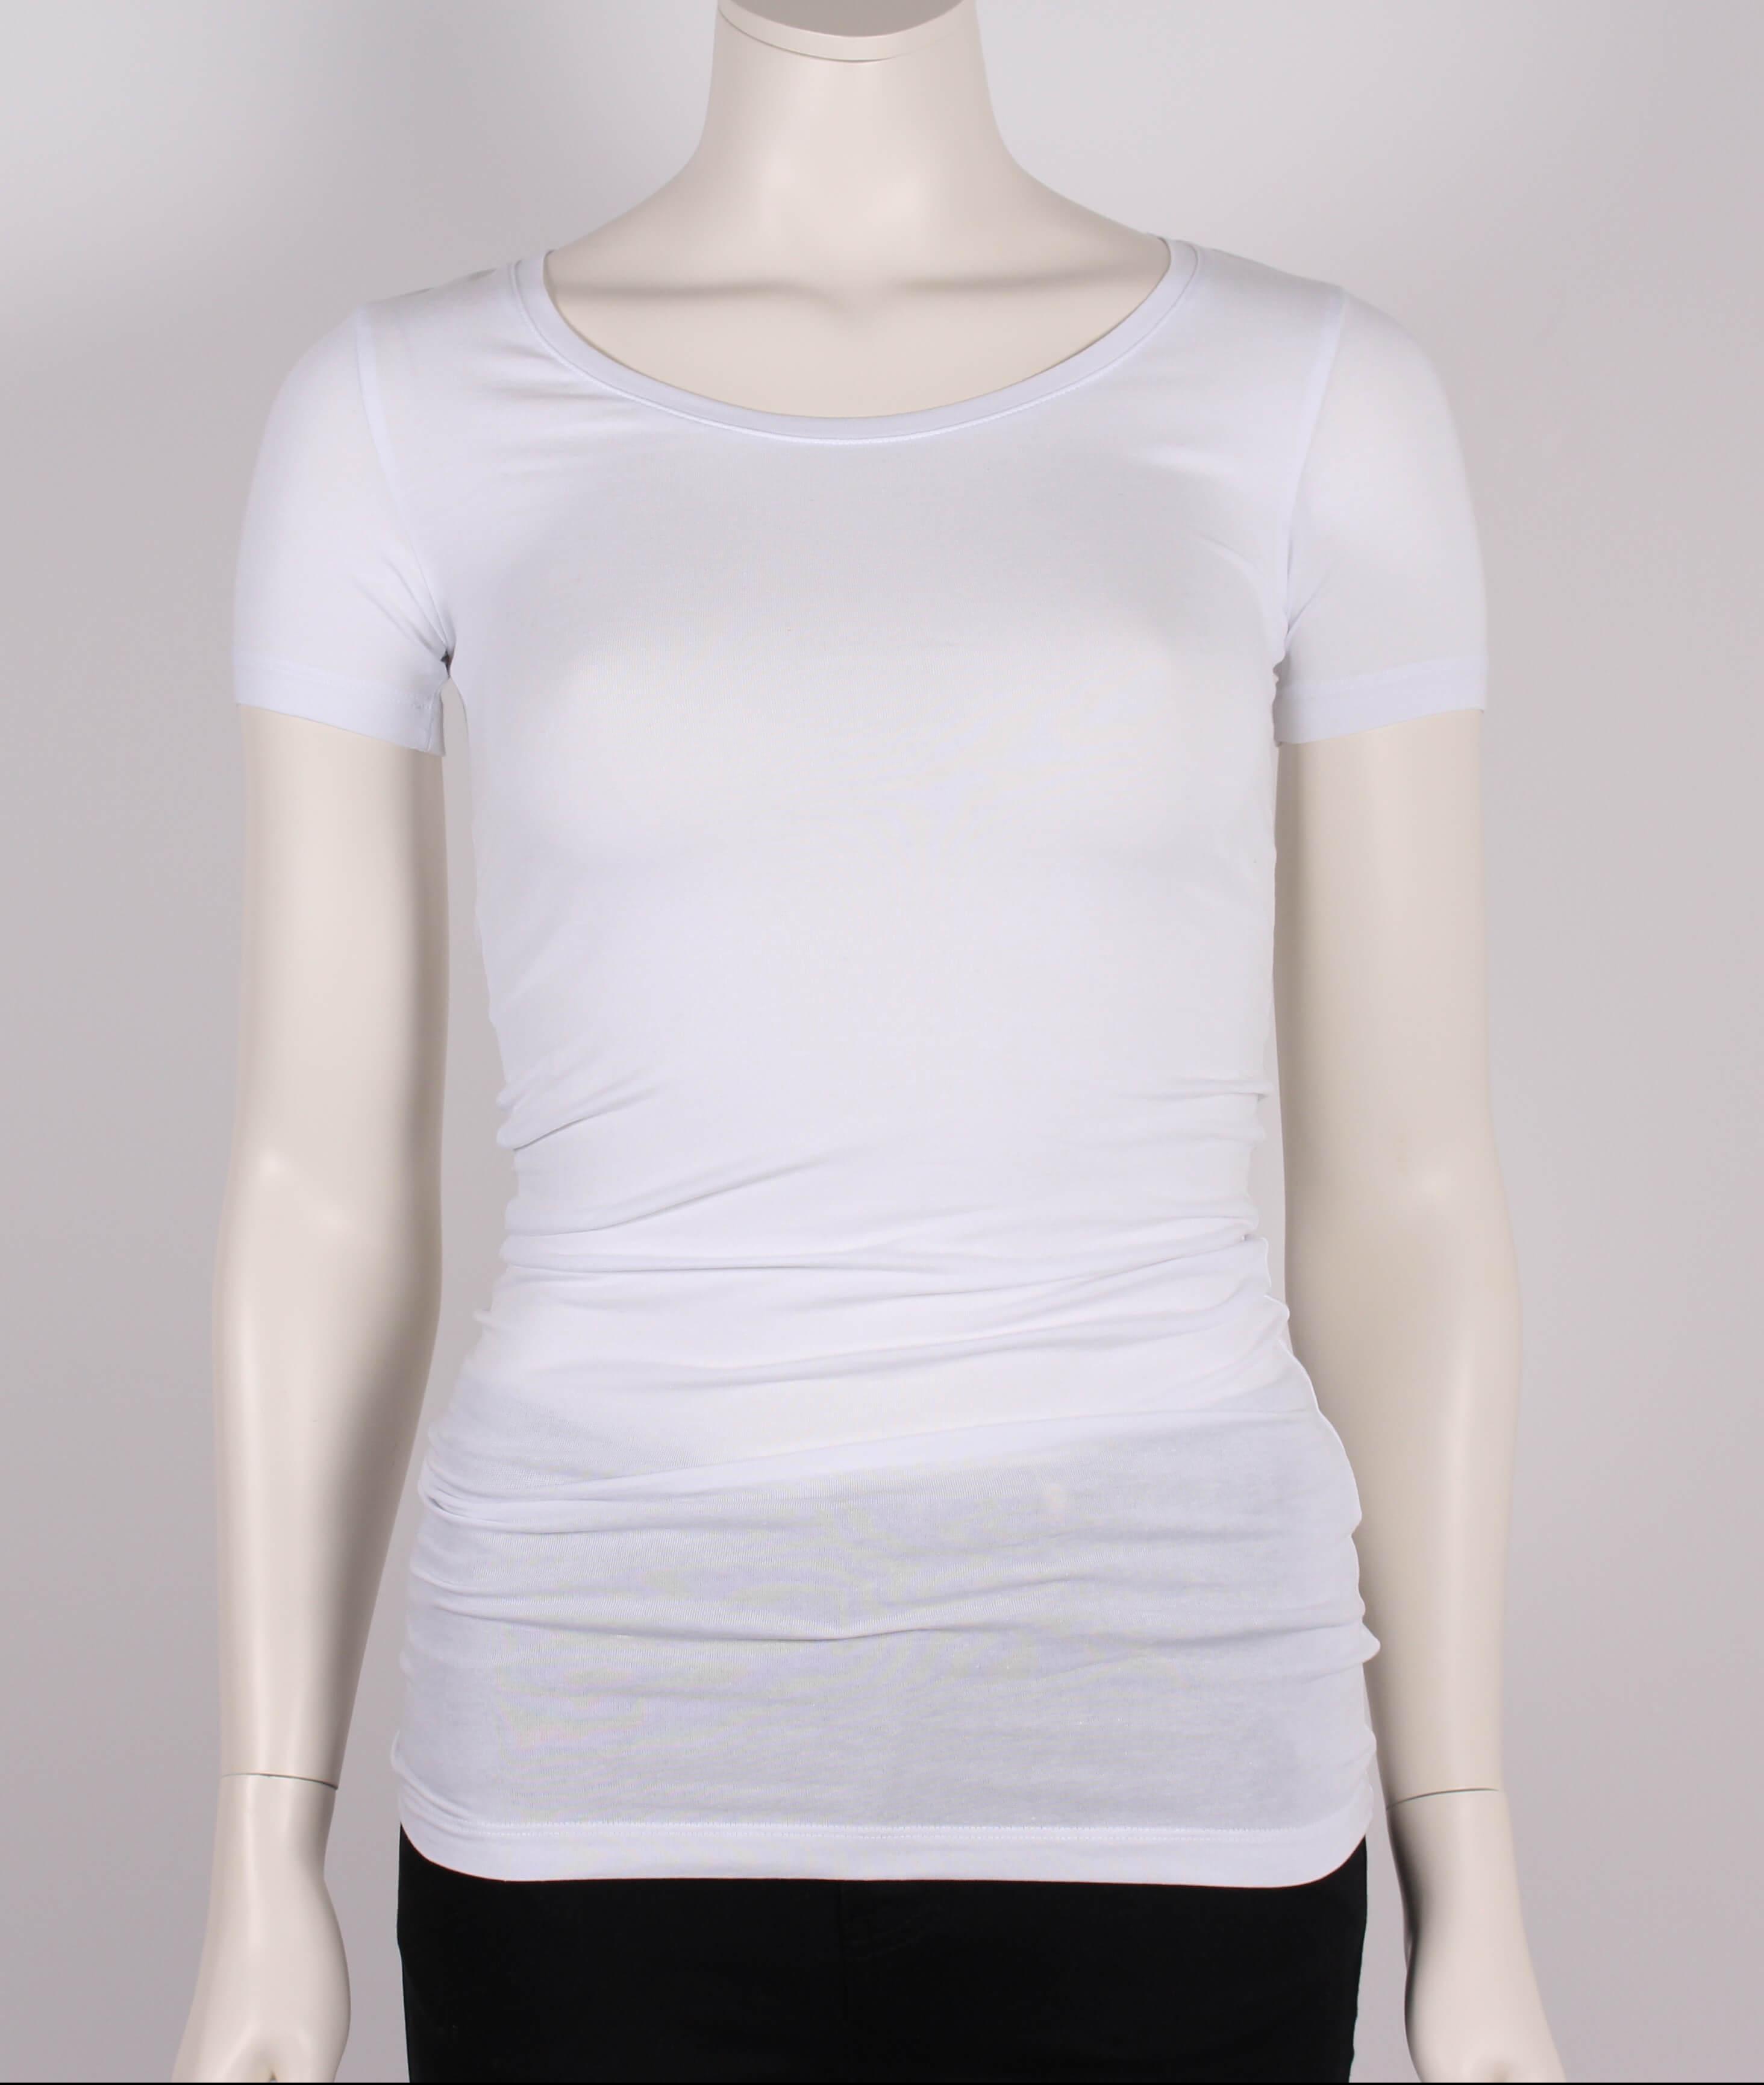 Samsøe Samsøe Female Sadie Solid T shirt kæ Hvid Tilbud